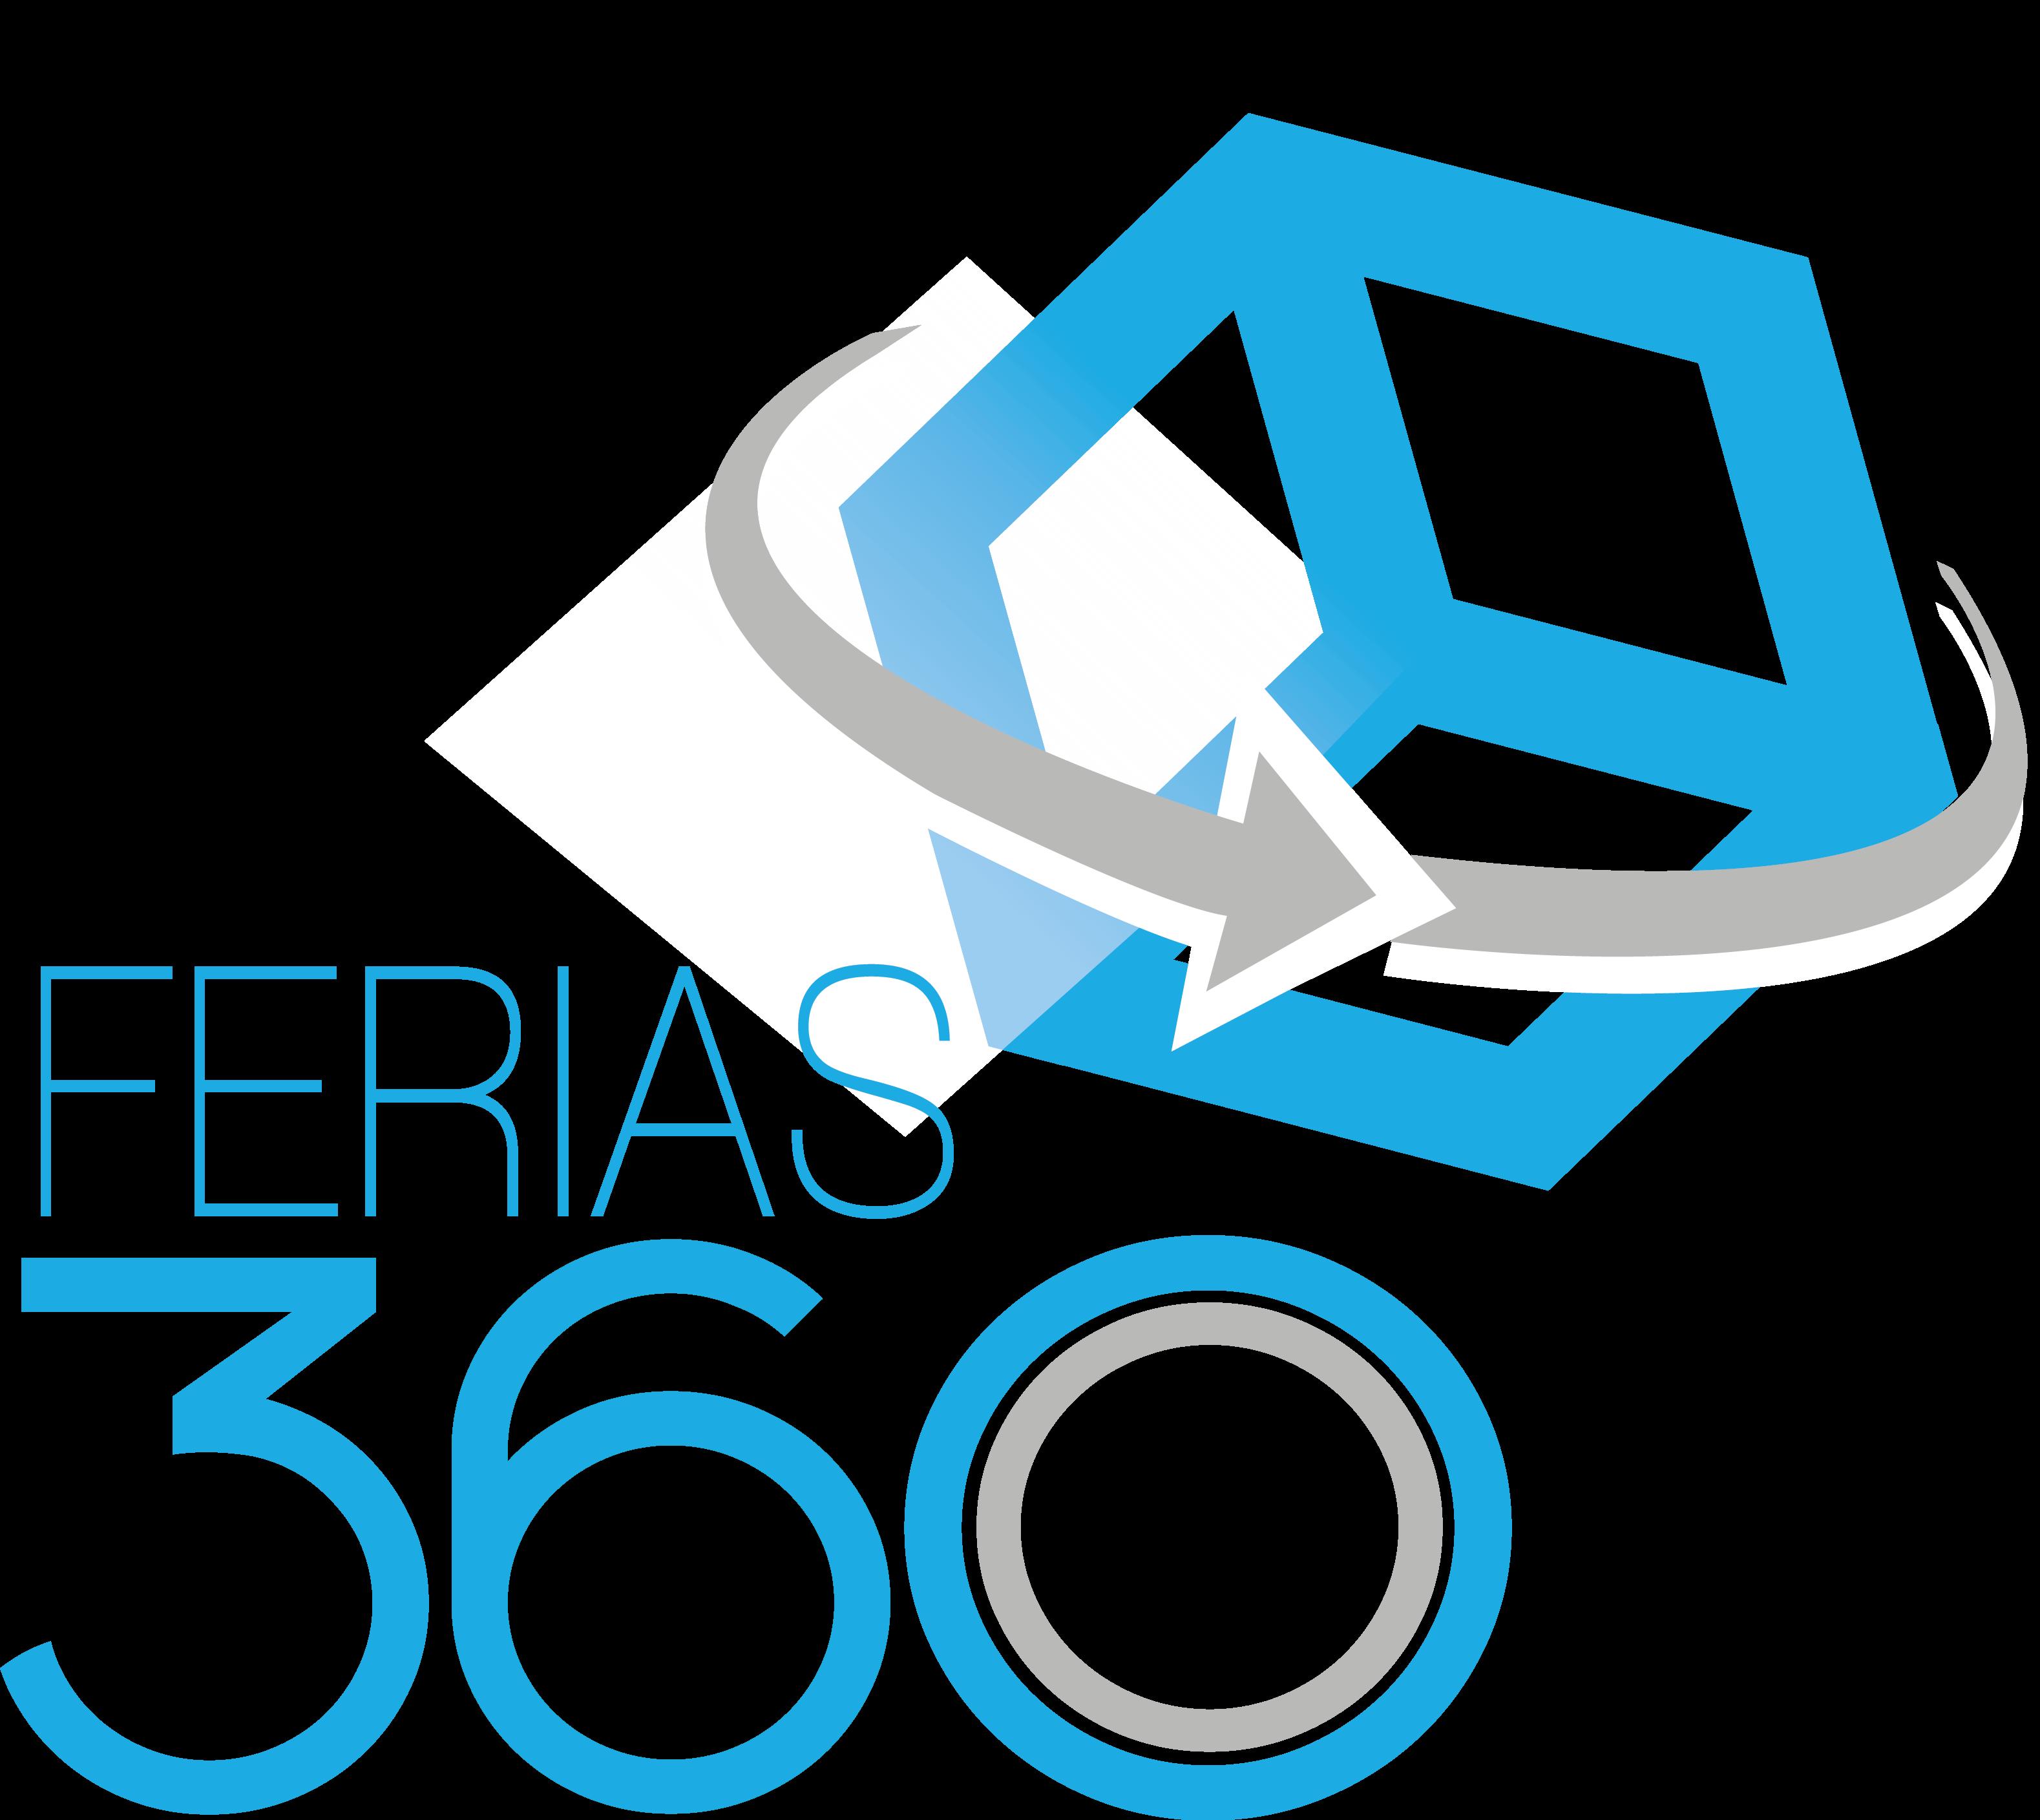 Plataforma Virtual 3D – Ferias 360